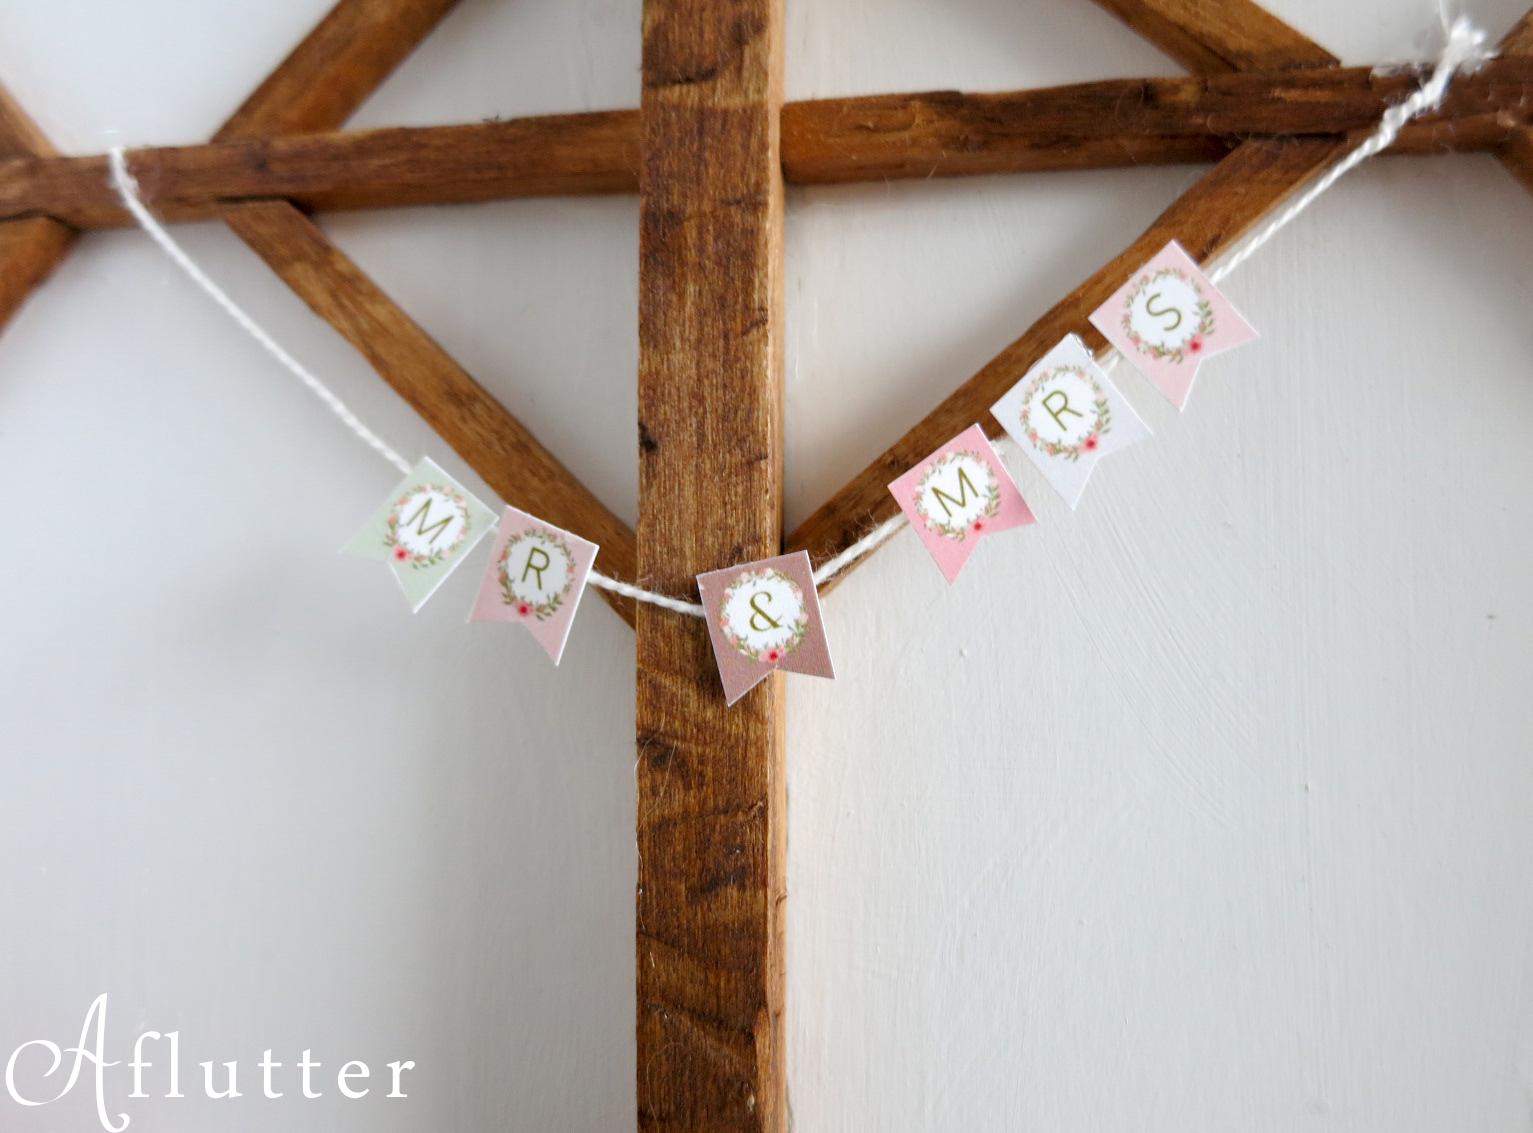 Brenul-Barn-Mini-Wedding-14-of-16.jpg